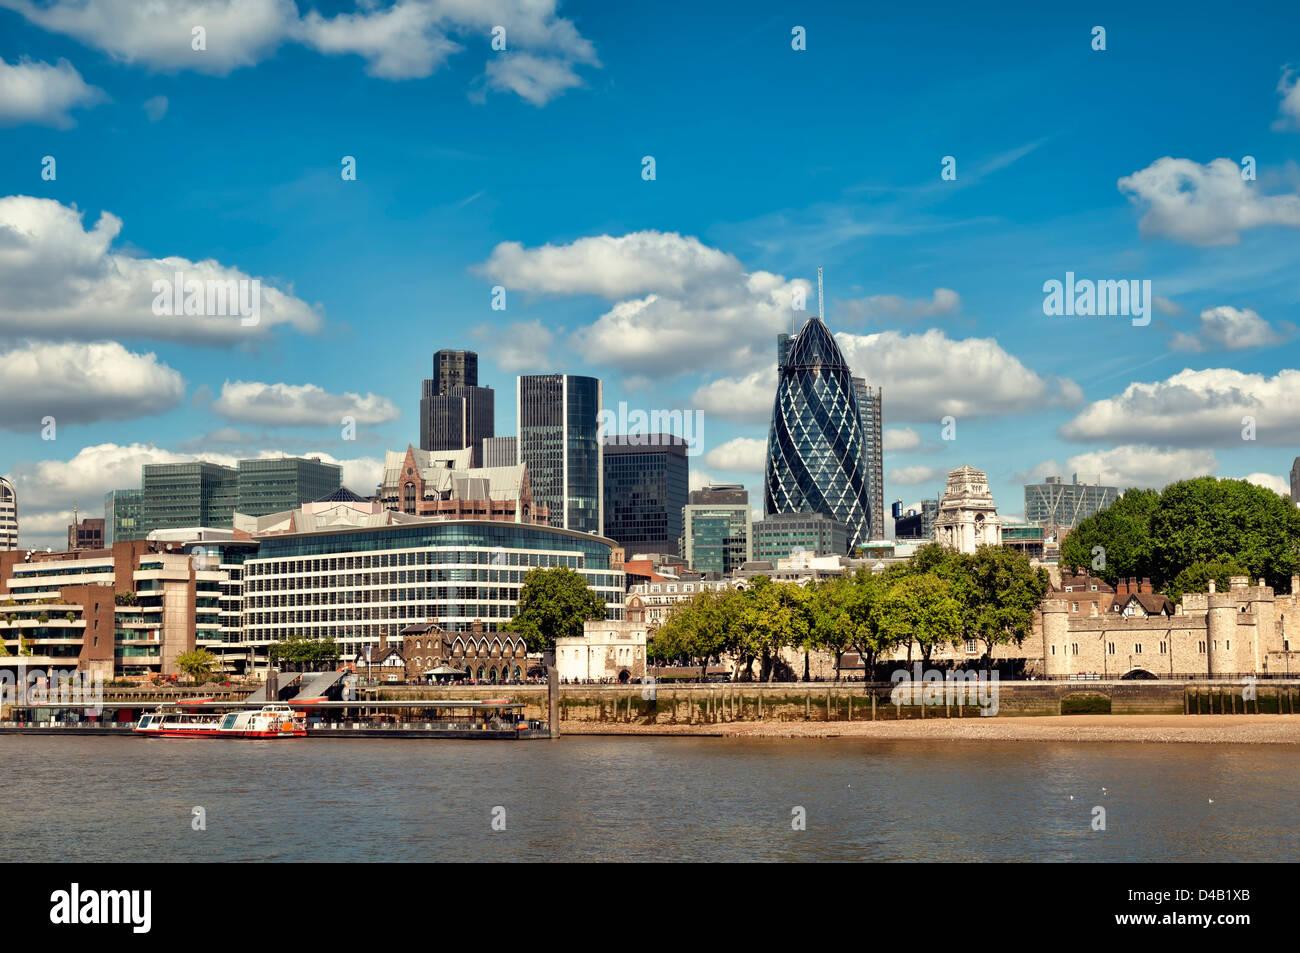 City of London skyline. (Tower 42, Willis Building, Aviva, Gherkin, Tower of London) - Stock Image